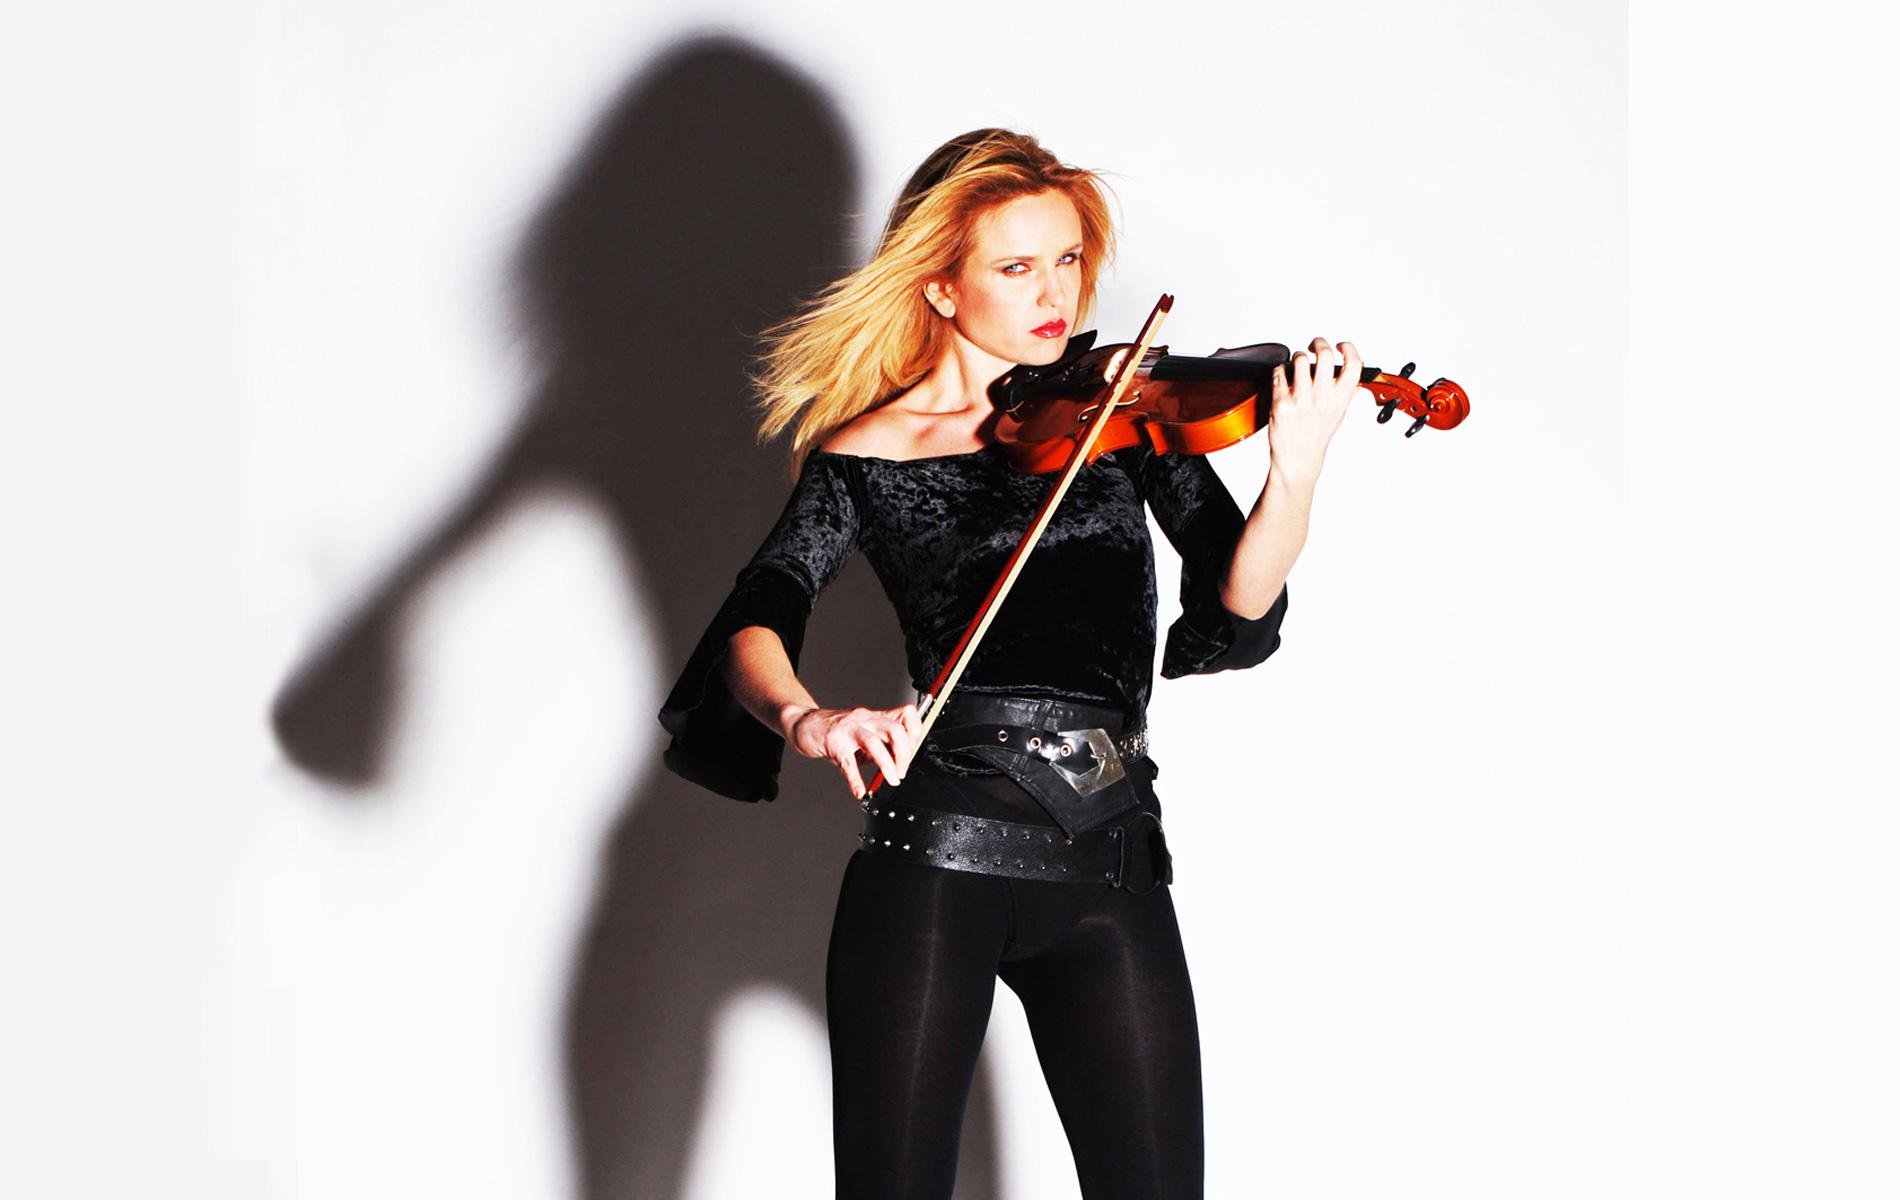 Monika MALINOWSKA - Violinist - Milan - ©Graziano Villa